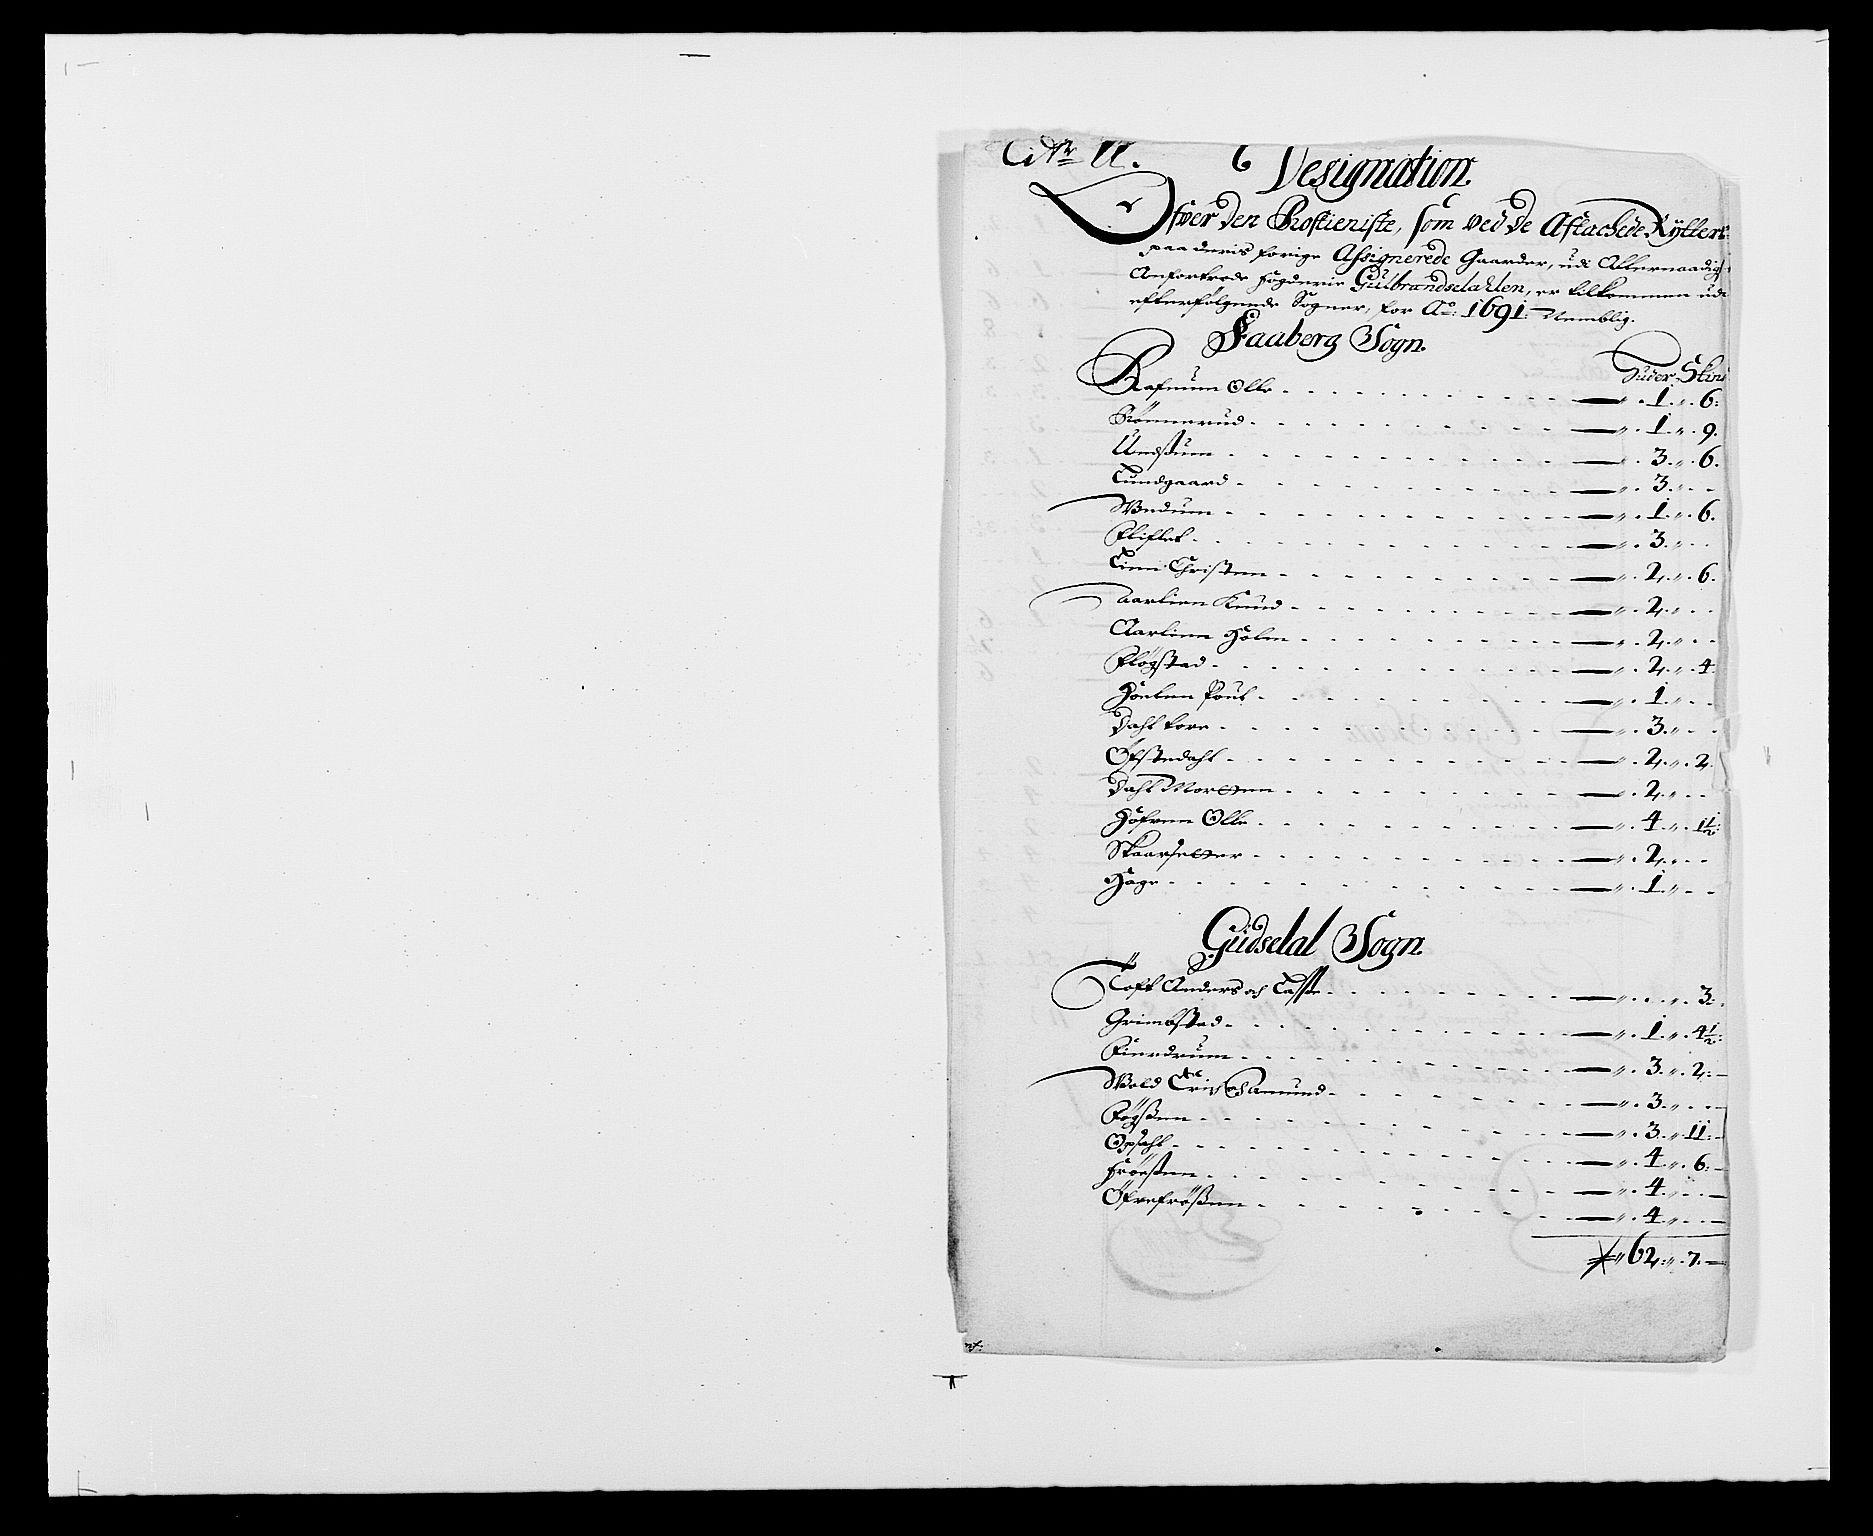 RA, Rentekammeret inntil 1814, Reviderte regnskaper, Fogderegnskap, R17/L1165: Fogderegnskap Gudbrandsdal, 1690-1692, s. 331